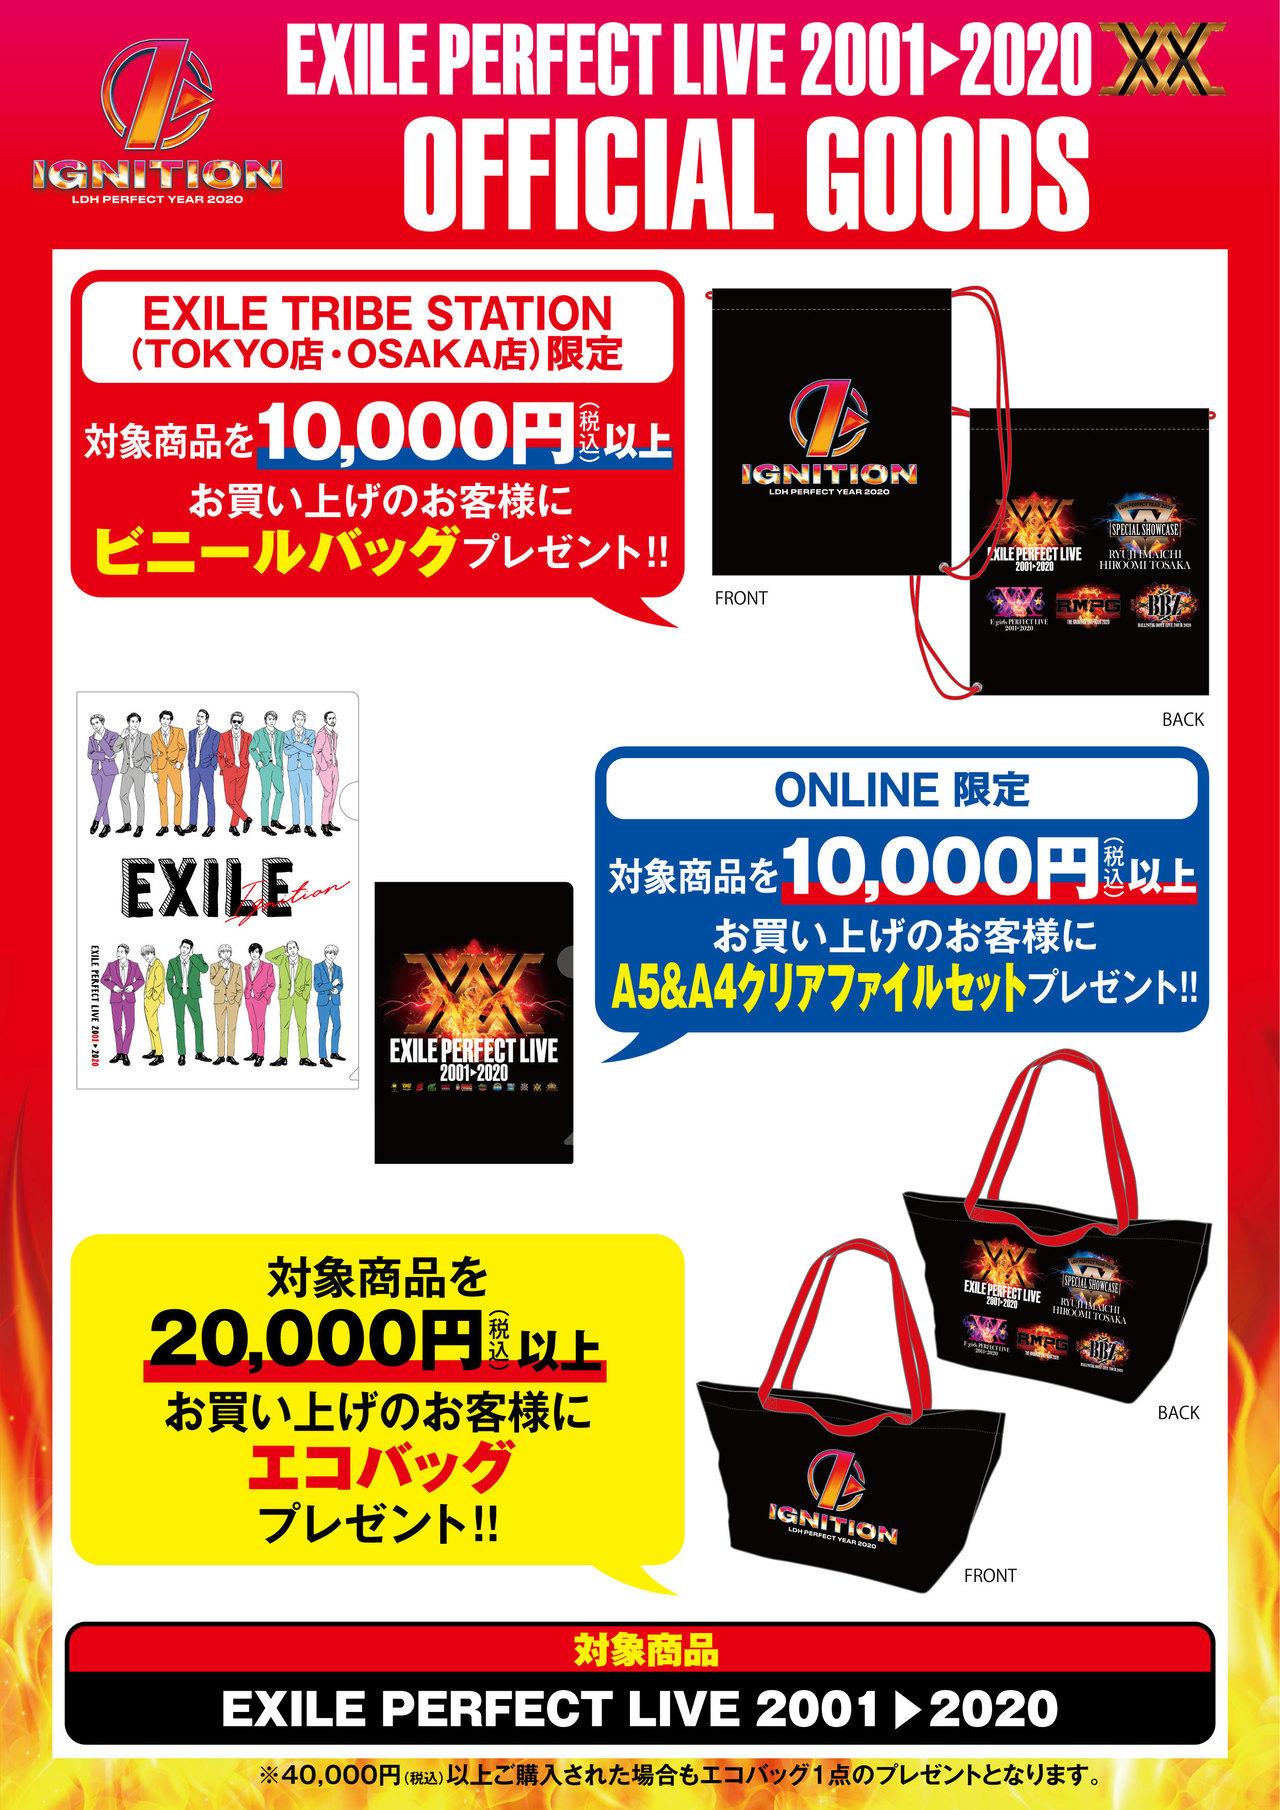 EXILEライブ2020福岡ドーム!セトリ・座席は?参戦者の感想も!